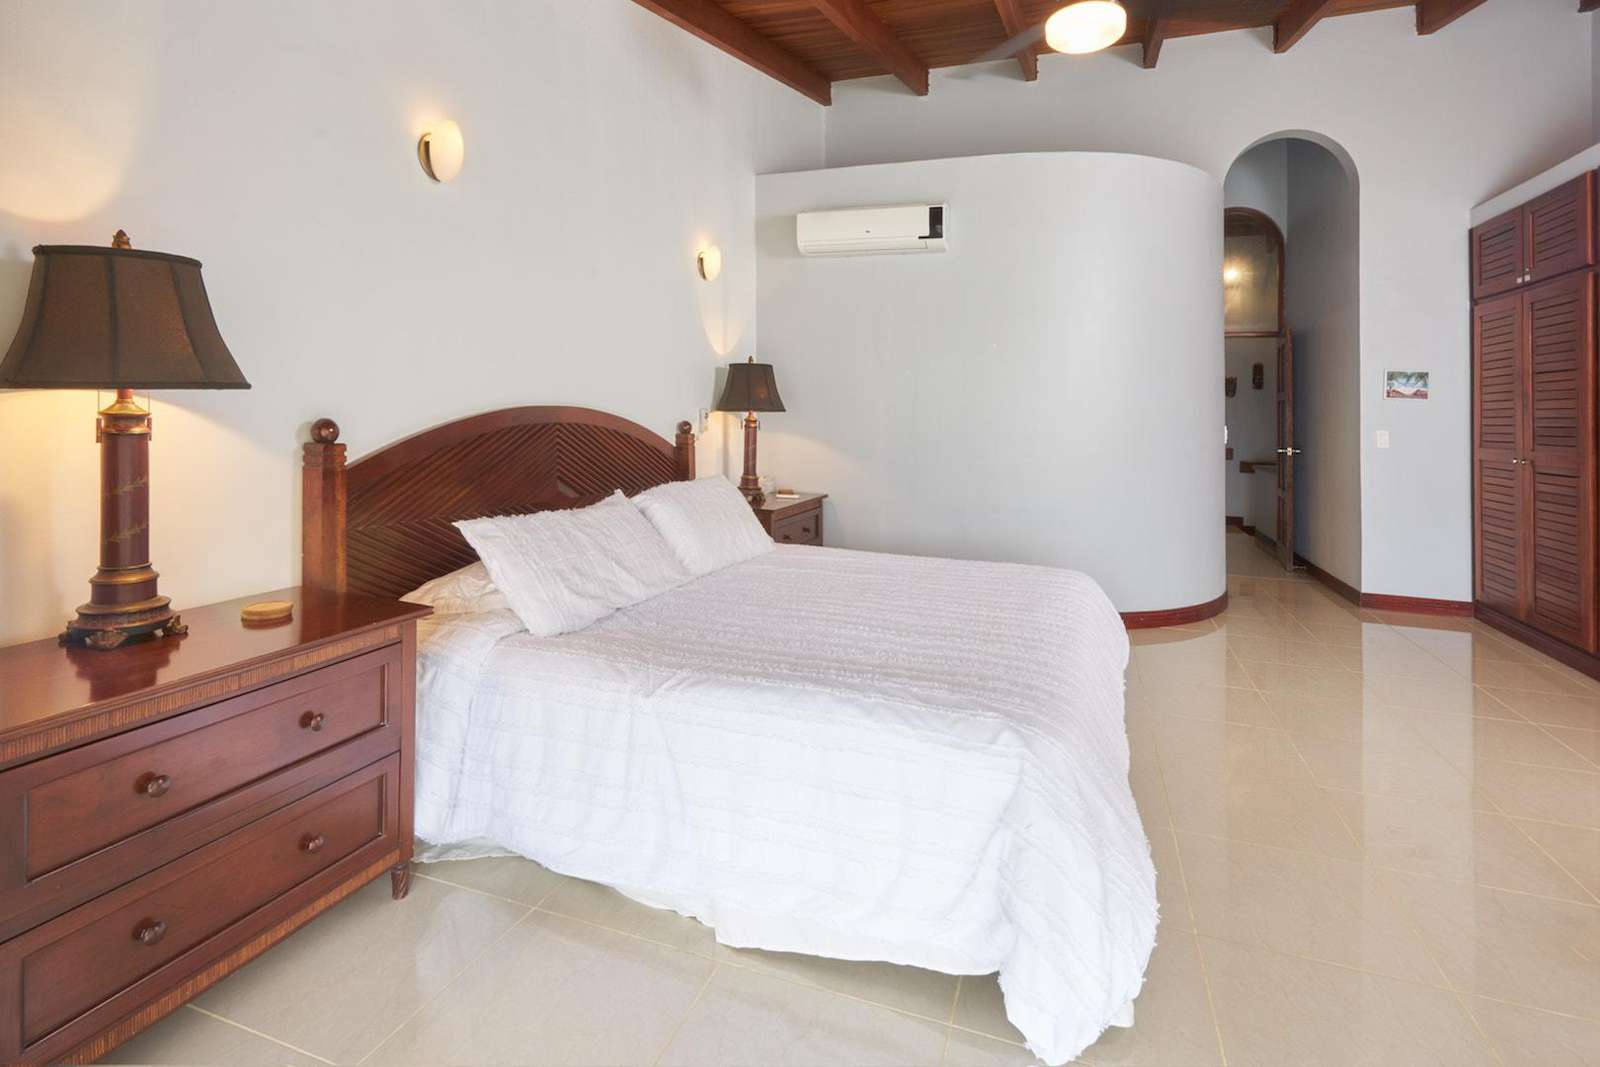 Master bedroom, king bed, ensuite bathroom